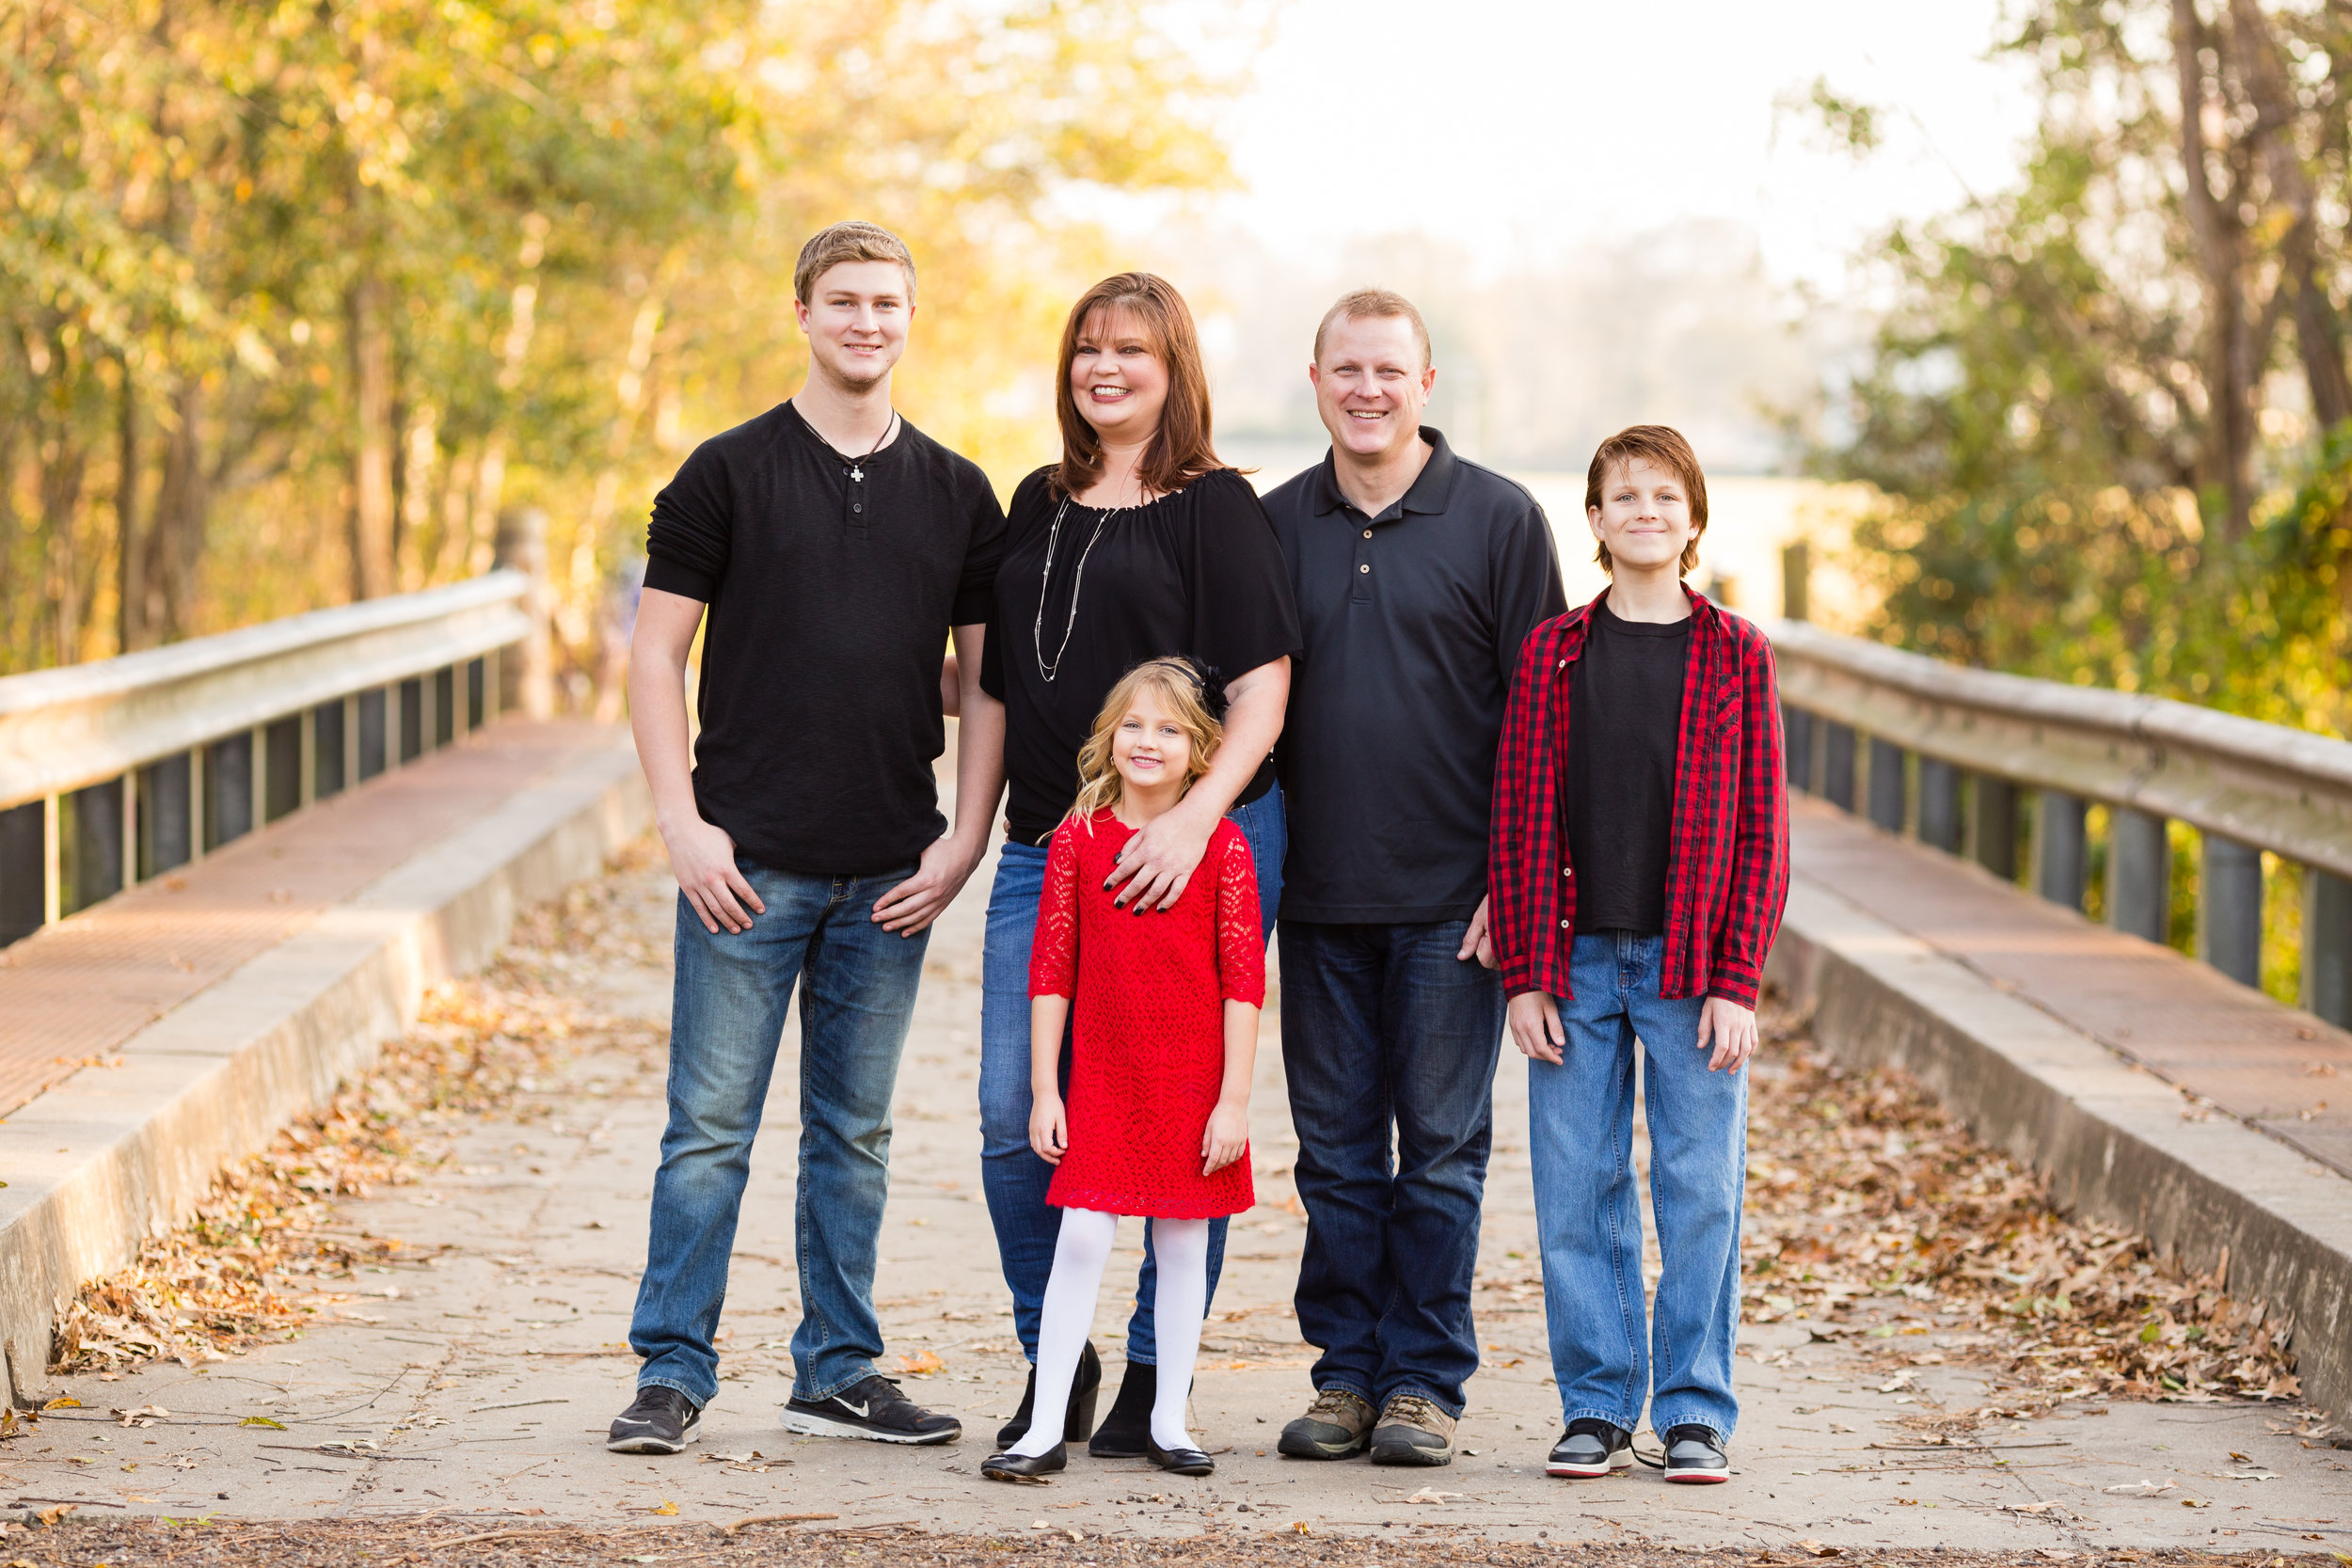 Family-child-portrait-lafayette-broussard-youngsville-photographer-1-4.jpg